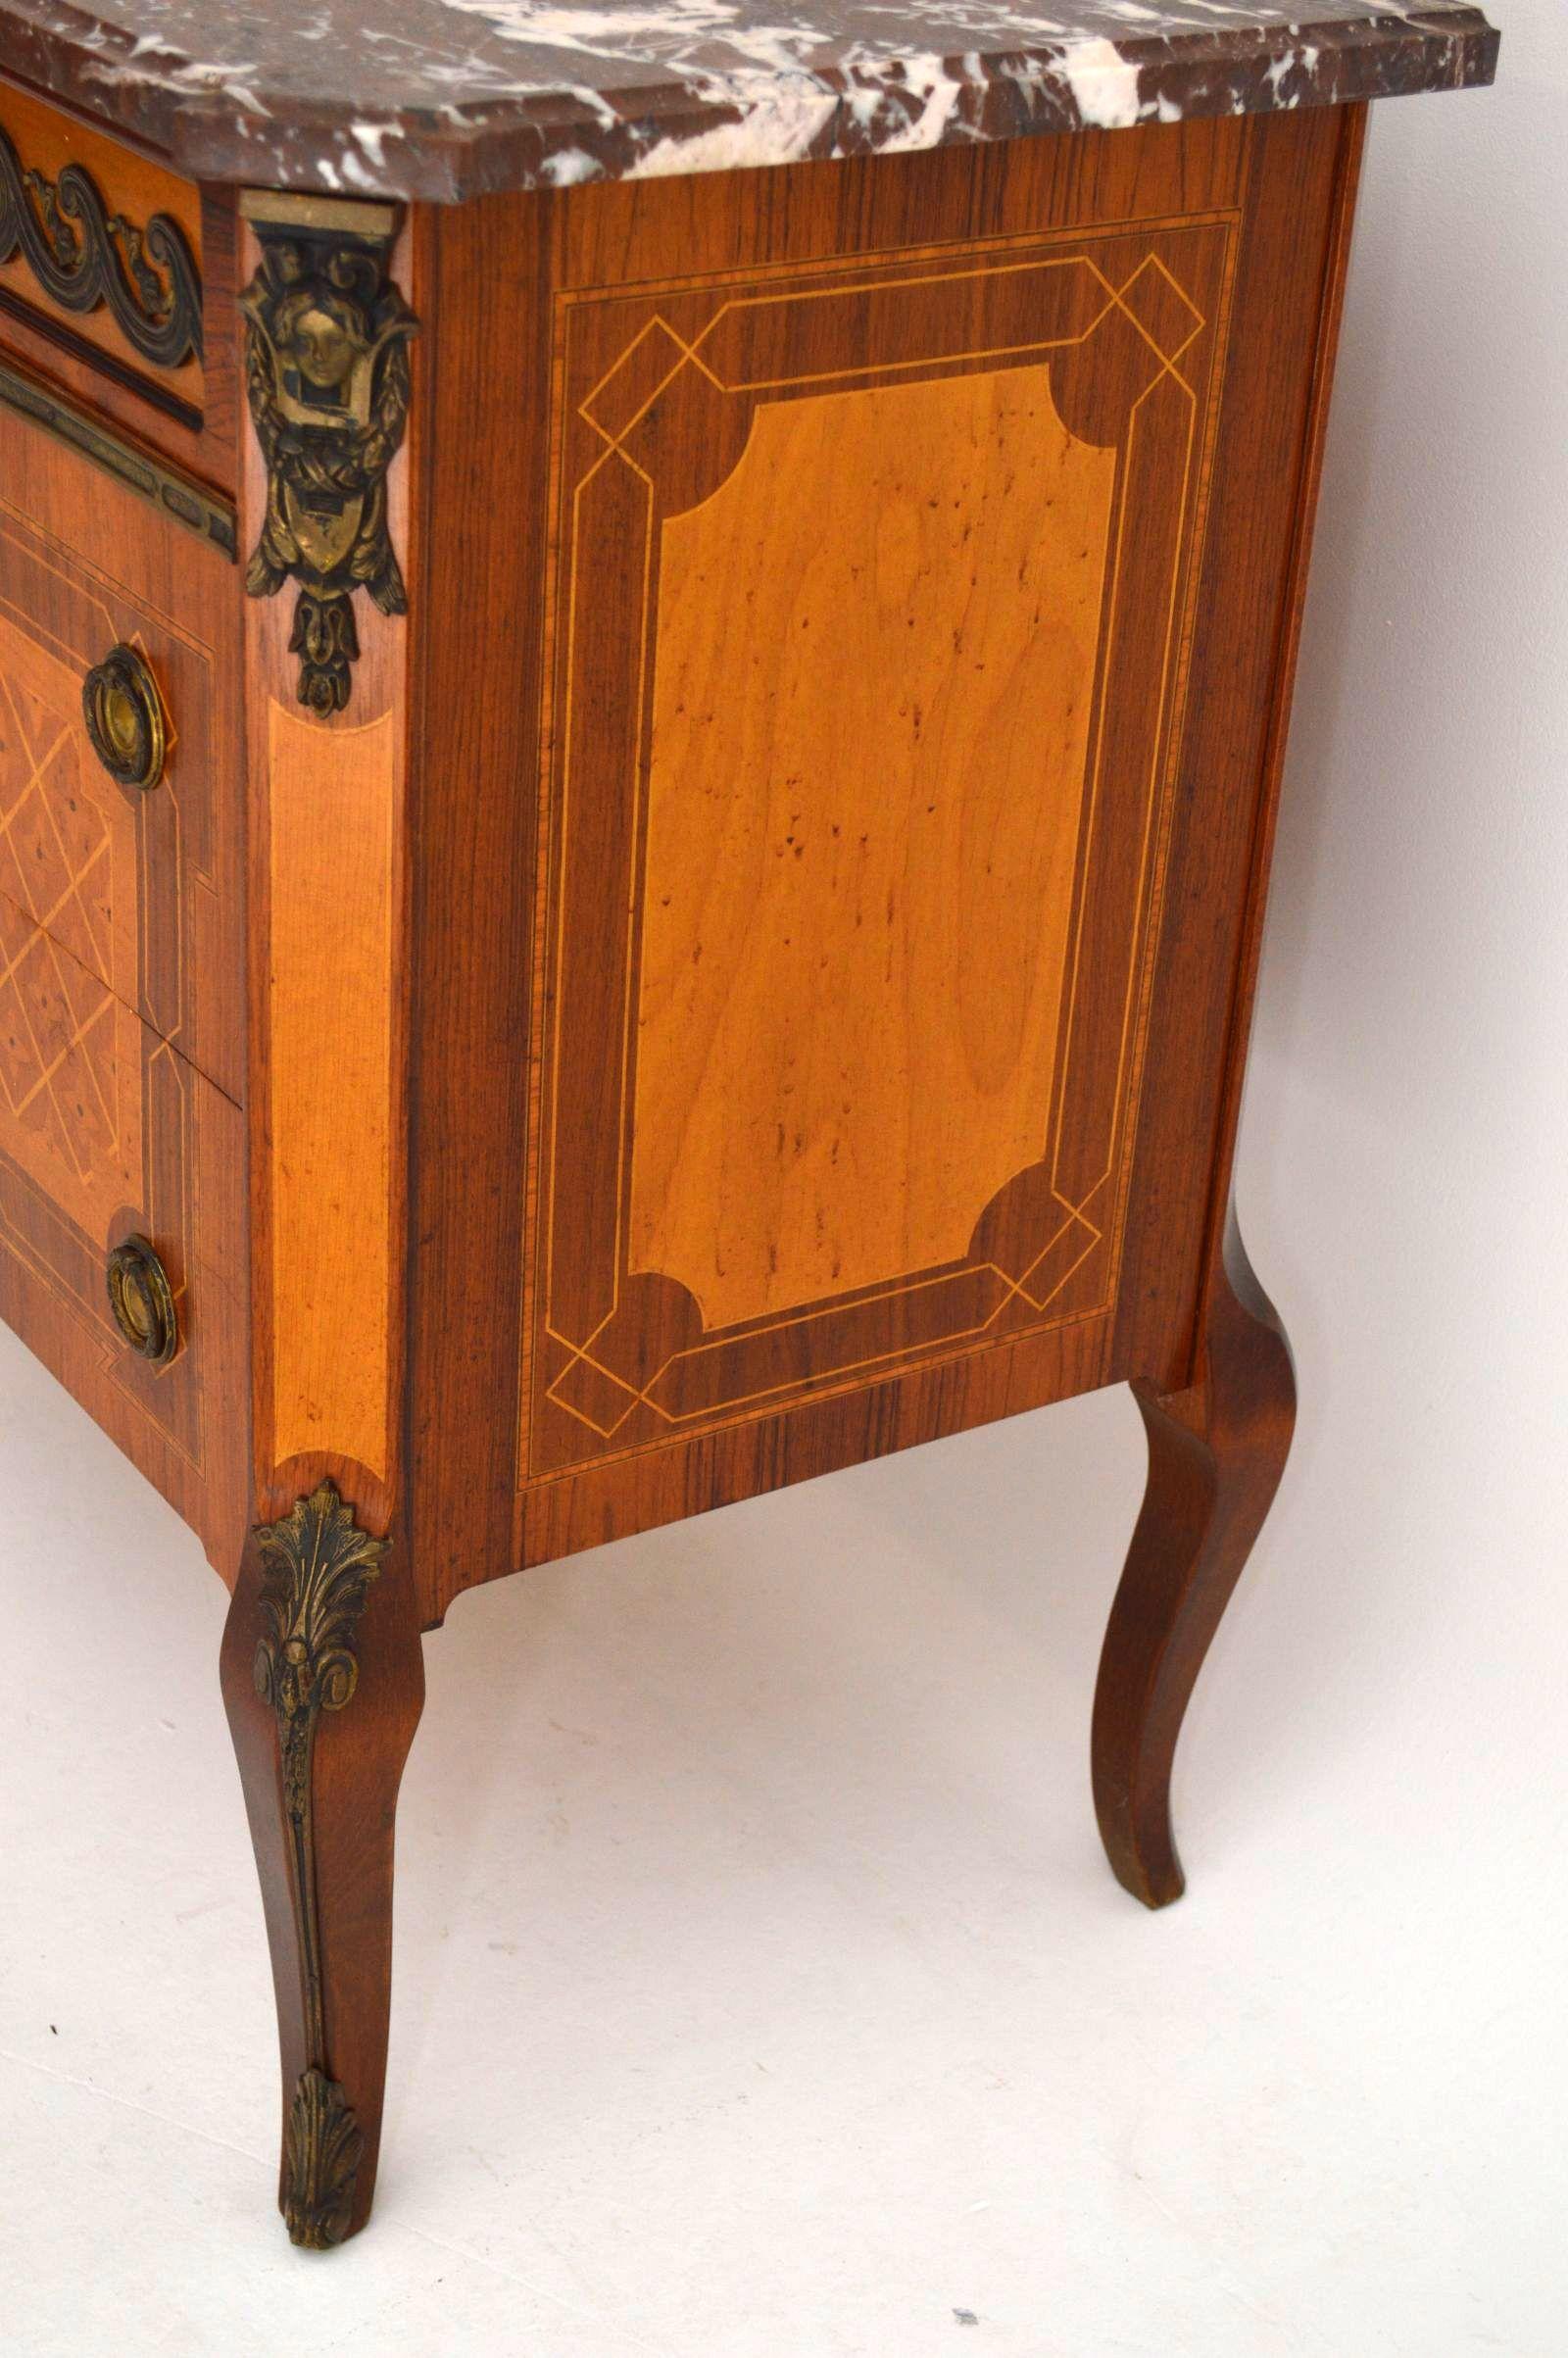 antike schwedische kommode mit marmorplatte. Black Bedroom Furniture Sets. Home Design Ideas